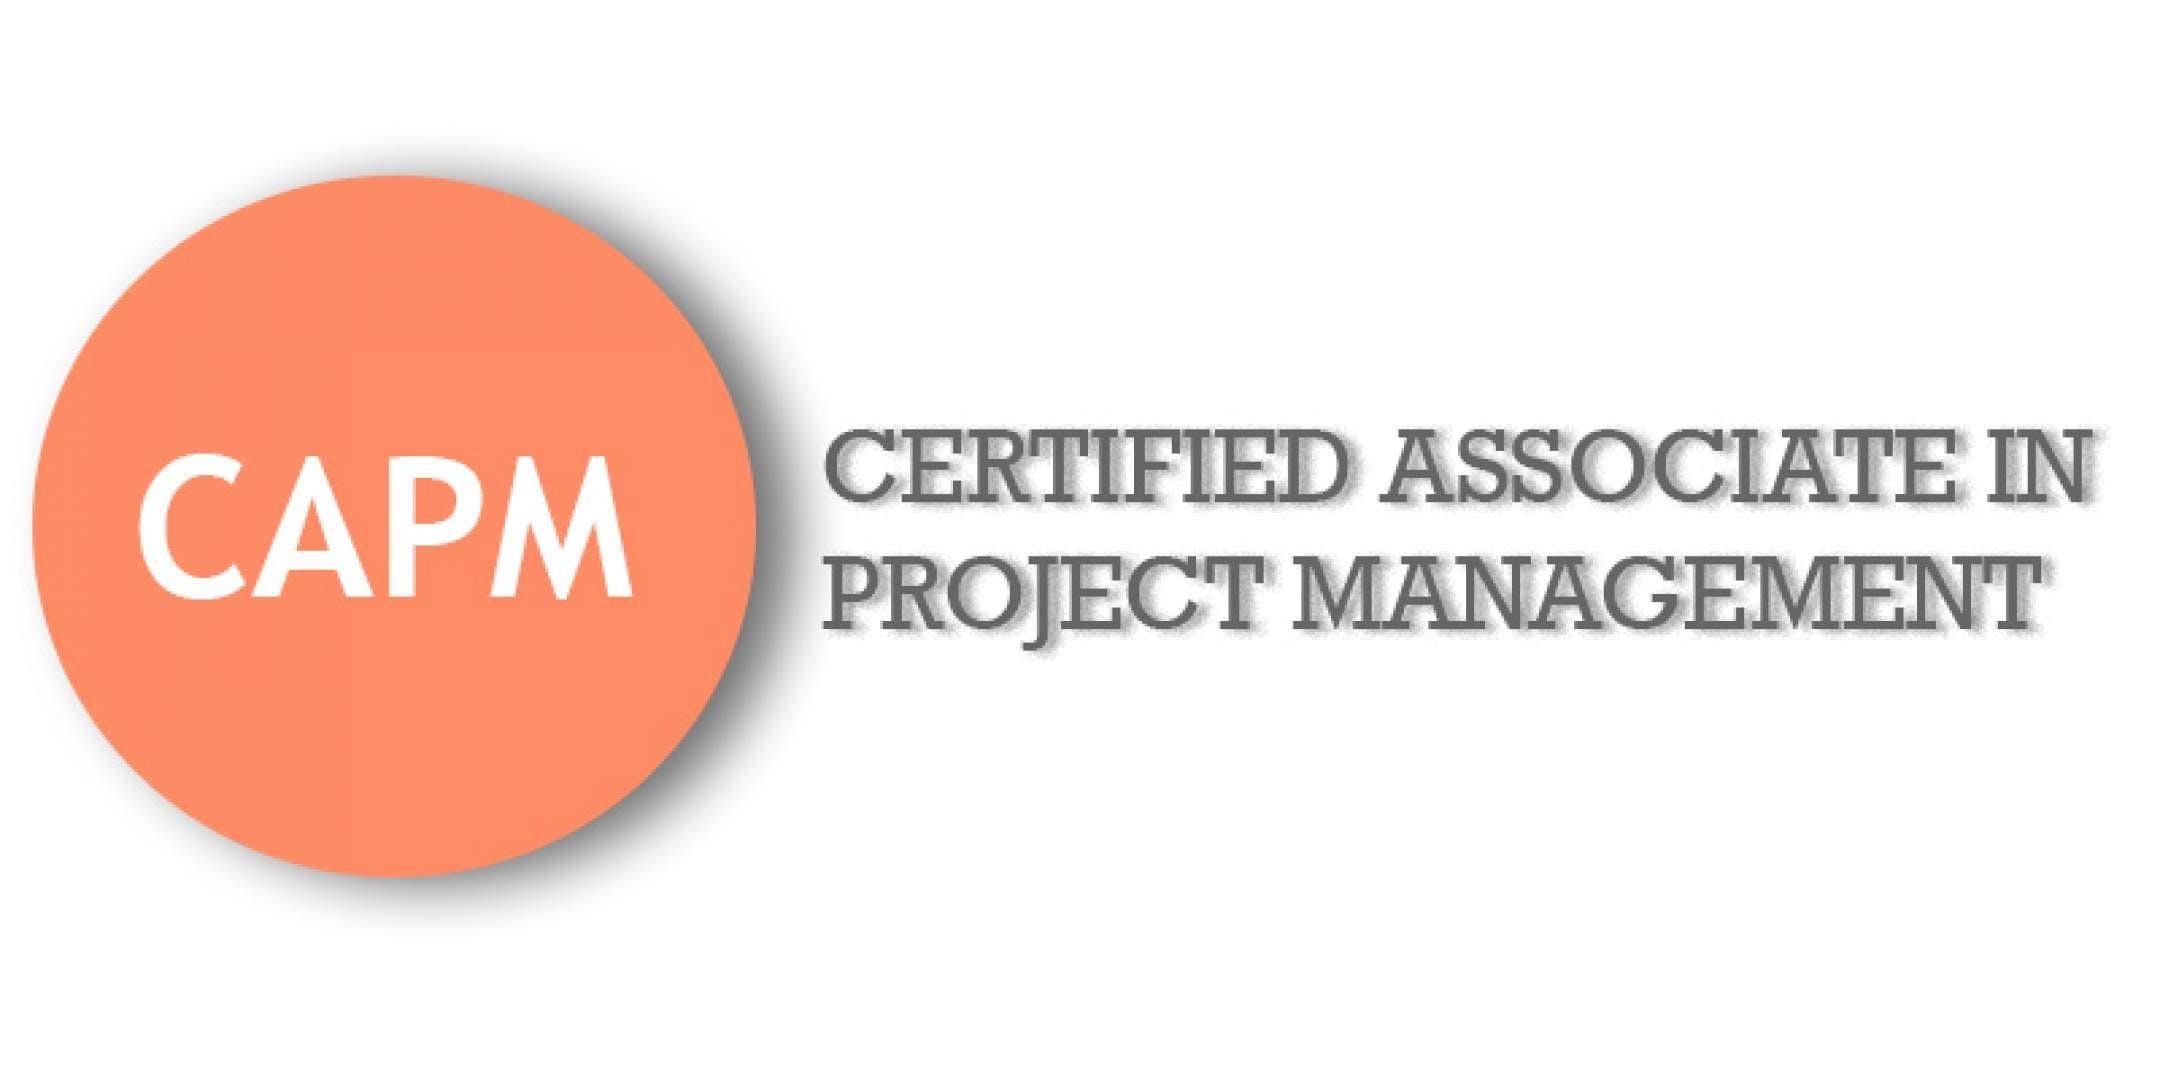 CAPM (Certified Associate In Project Management) Training in Phoenix, AZ